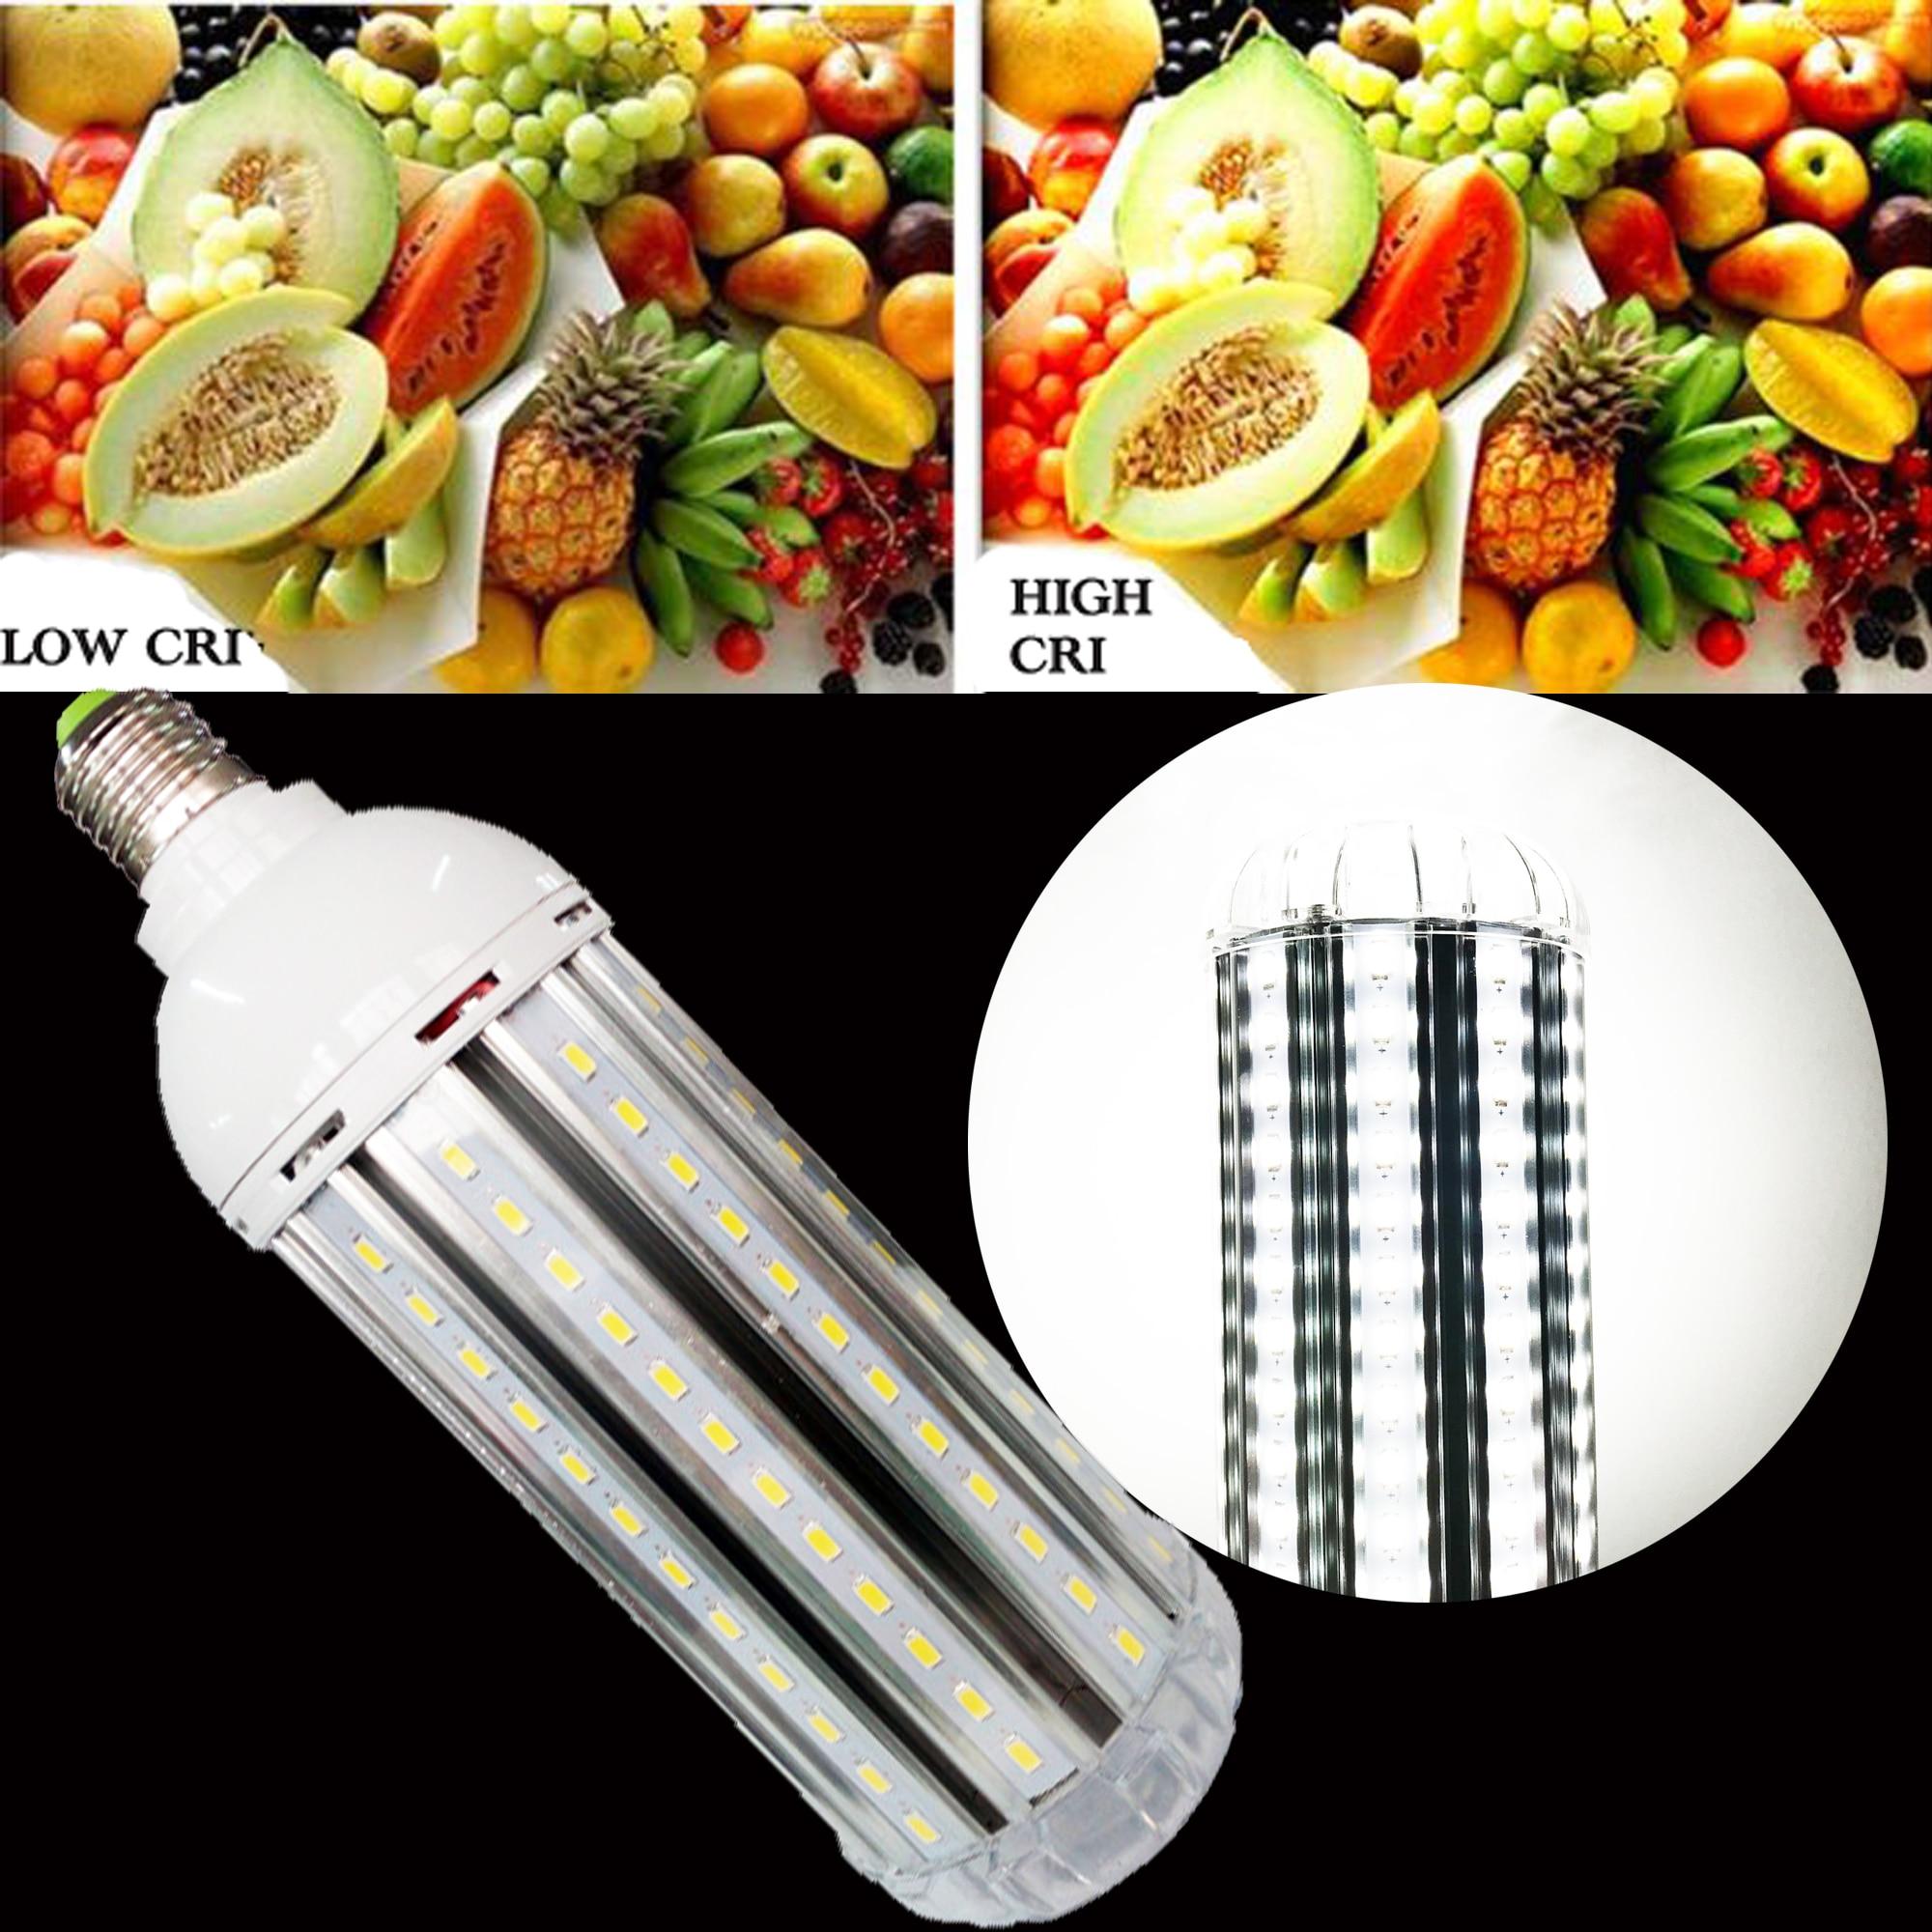 Hohe CRI Ra 95 + E27 Led-lampen Mais Lampe 40W AC85-265V Ultra Helle 5500K Tageslicht Weiß 4000LM für Fotografie Video Studio